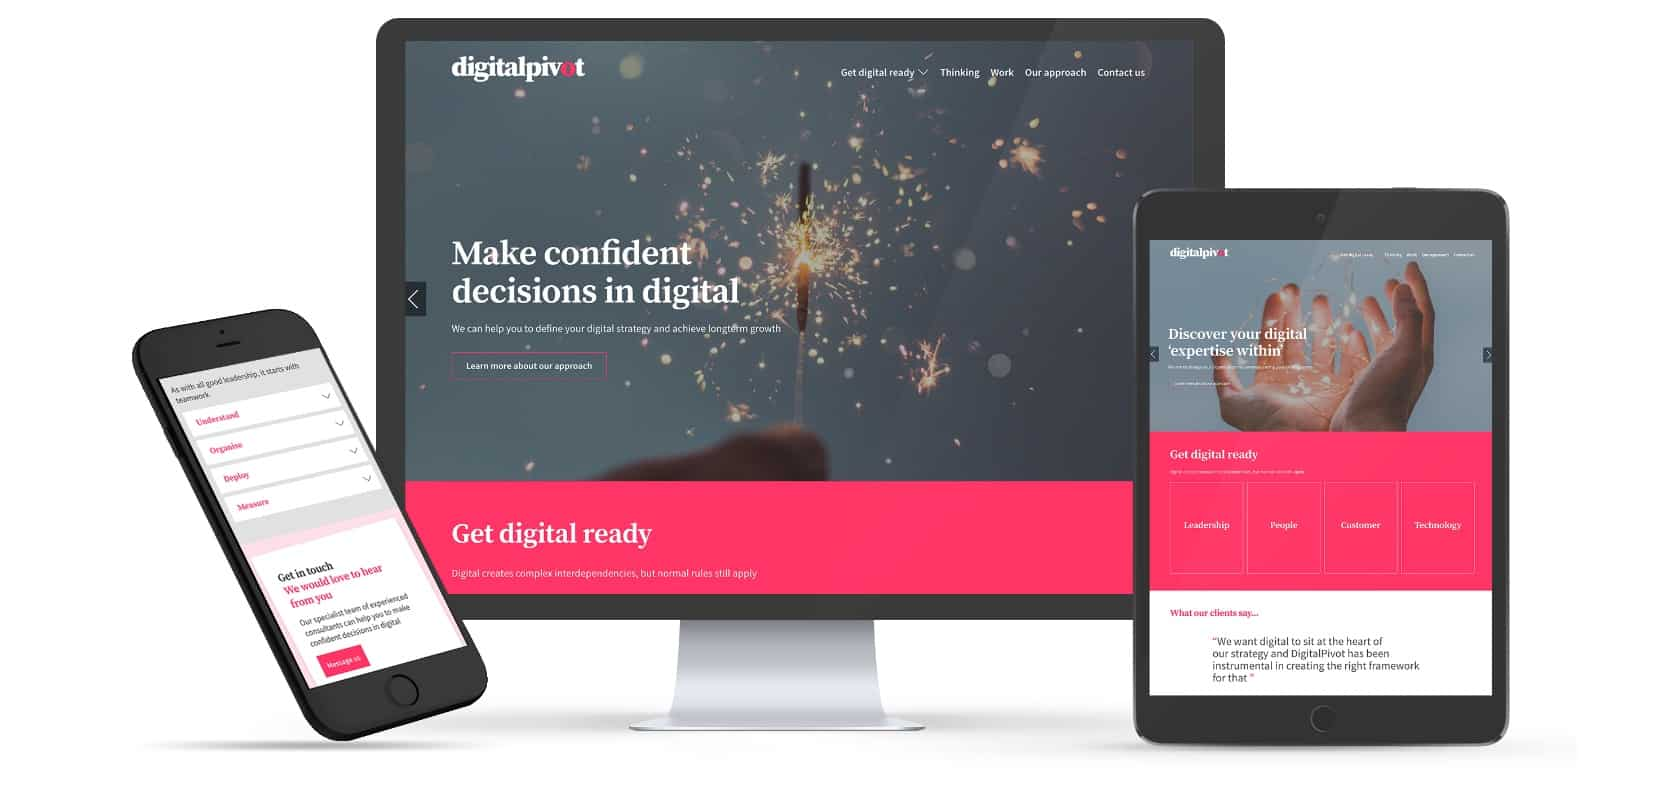 Website and branding for DigitalPivot a London digital transformation consultancy.